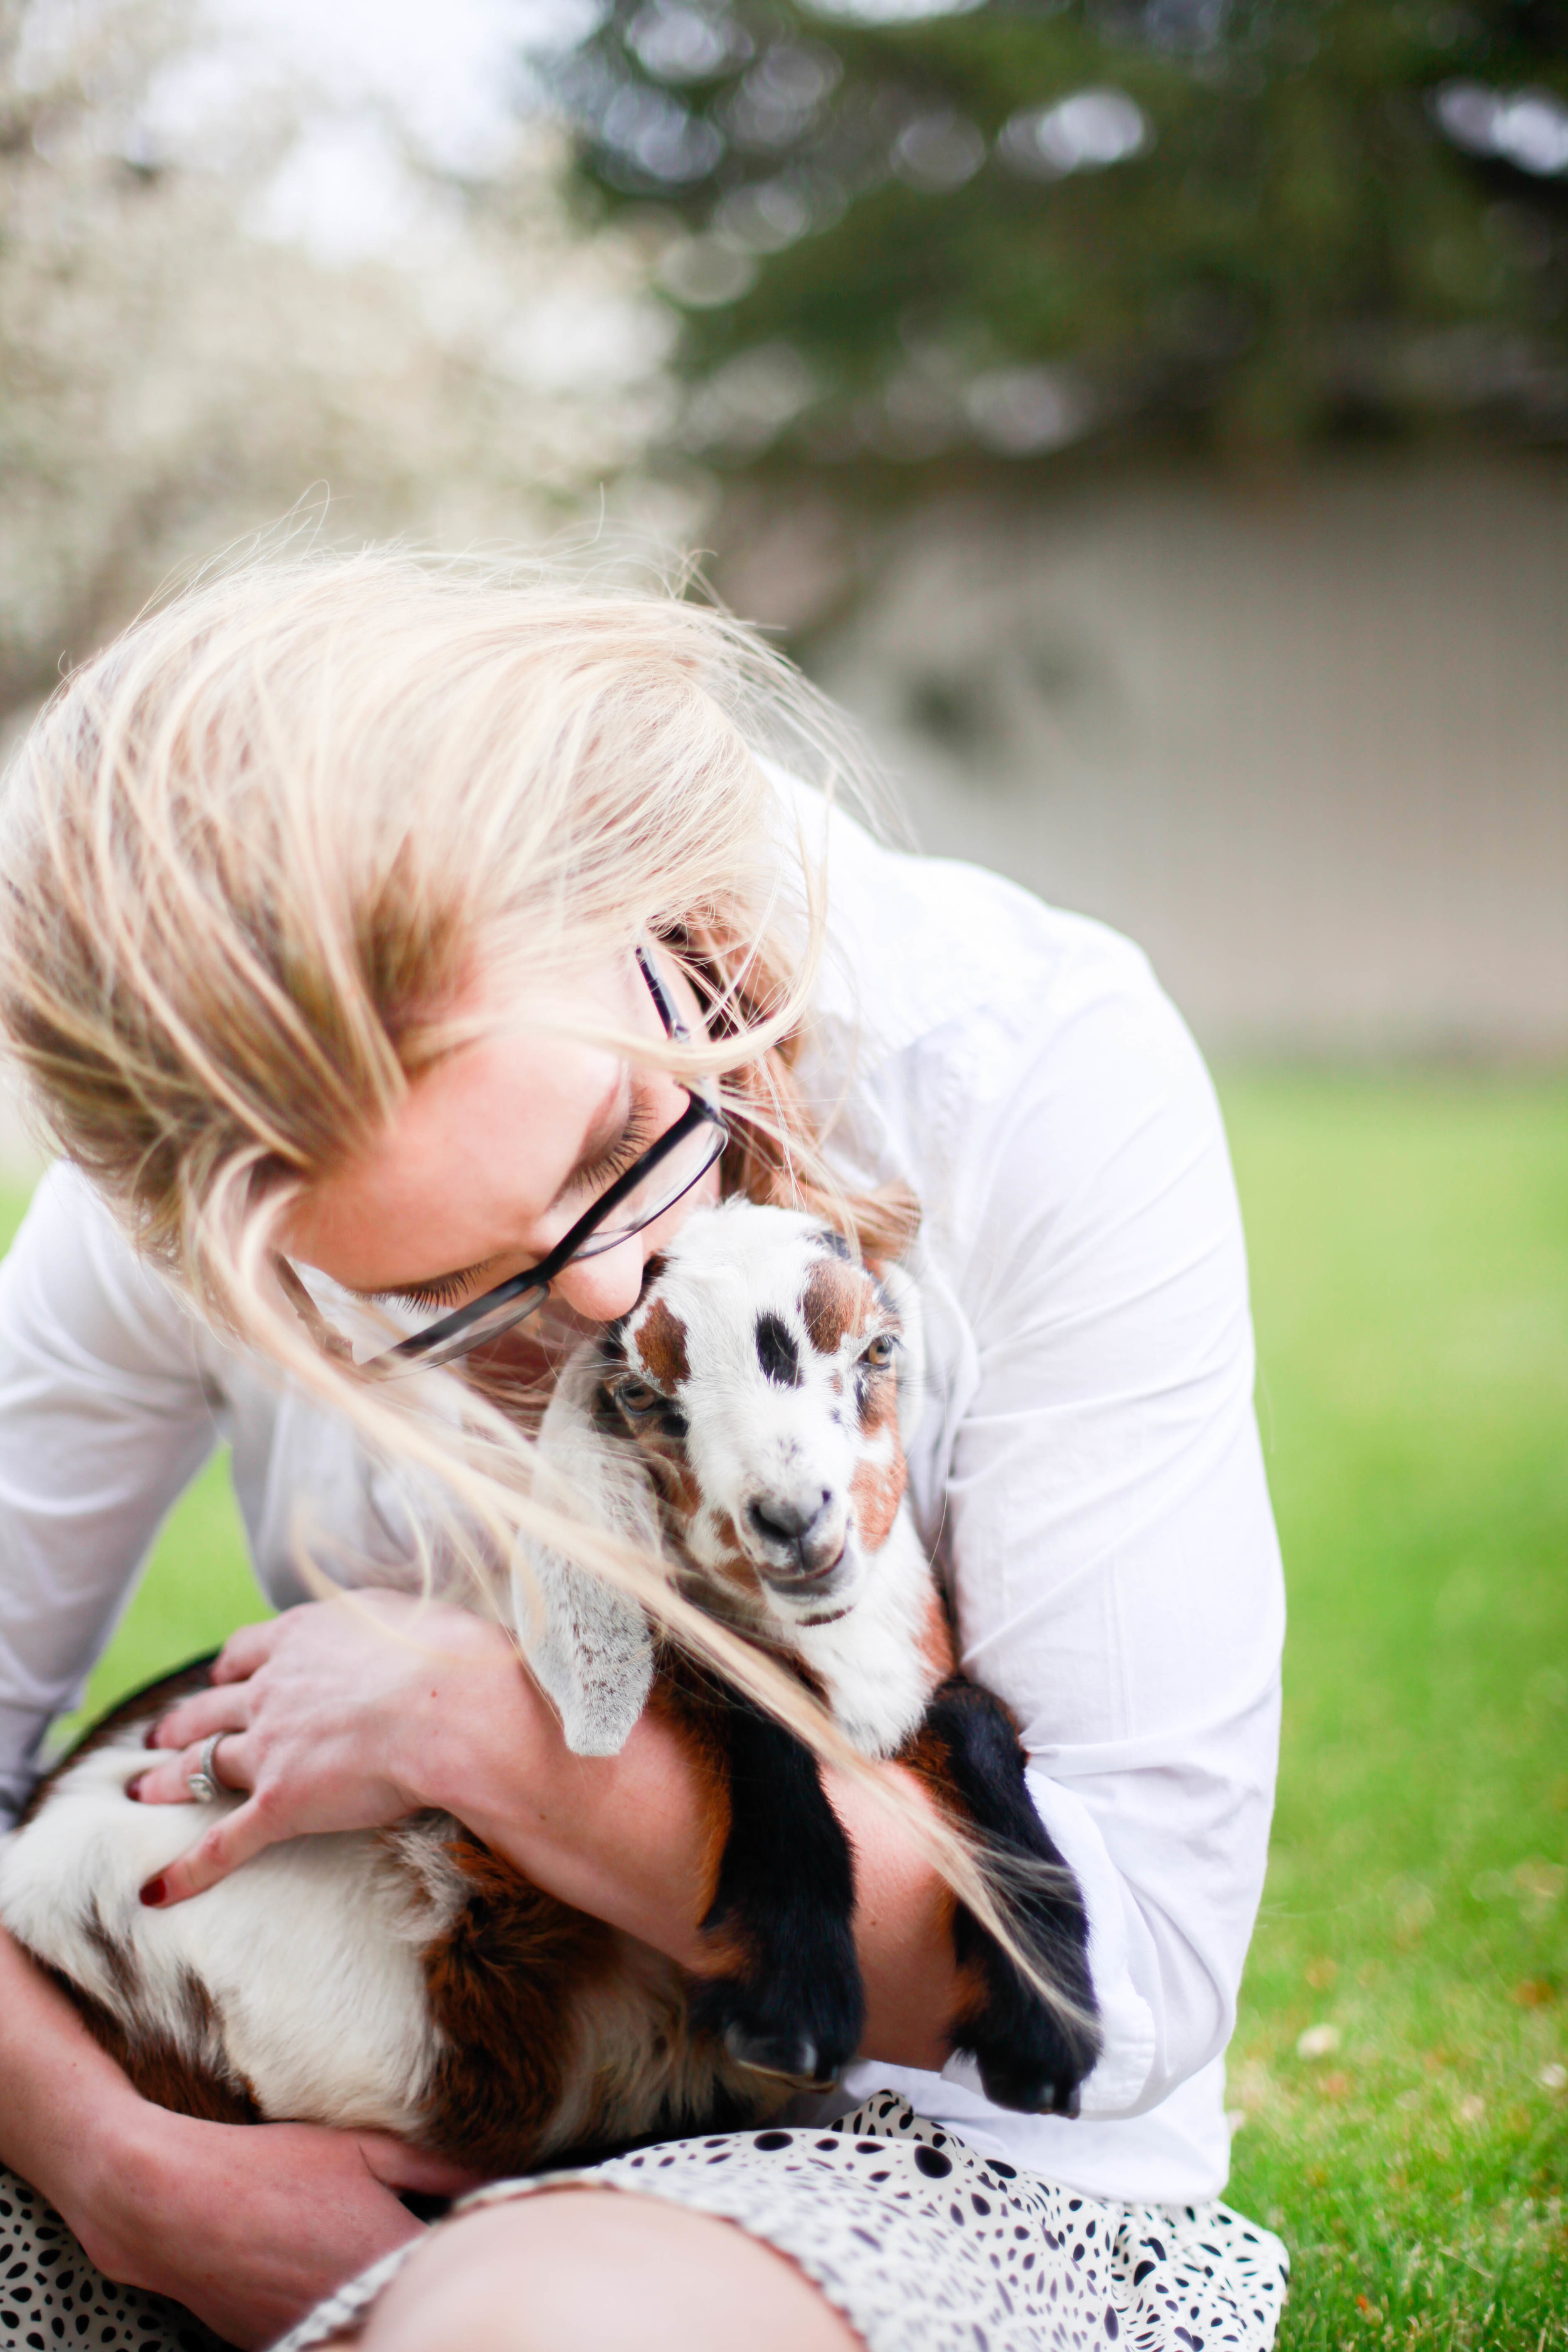 Baby nubian goats from boxwoodavenue.com [Rachel L'Antigua Photography]